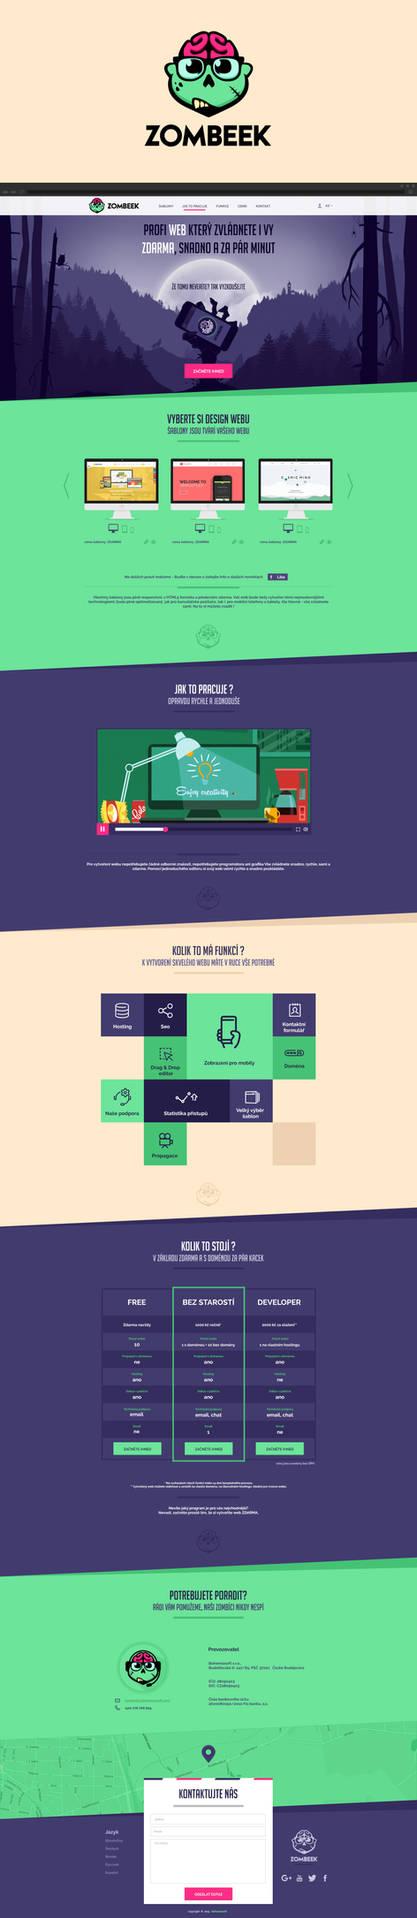 Zombeek Webdesign